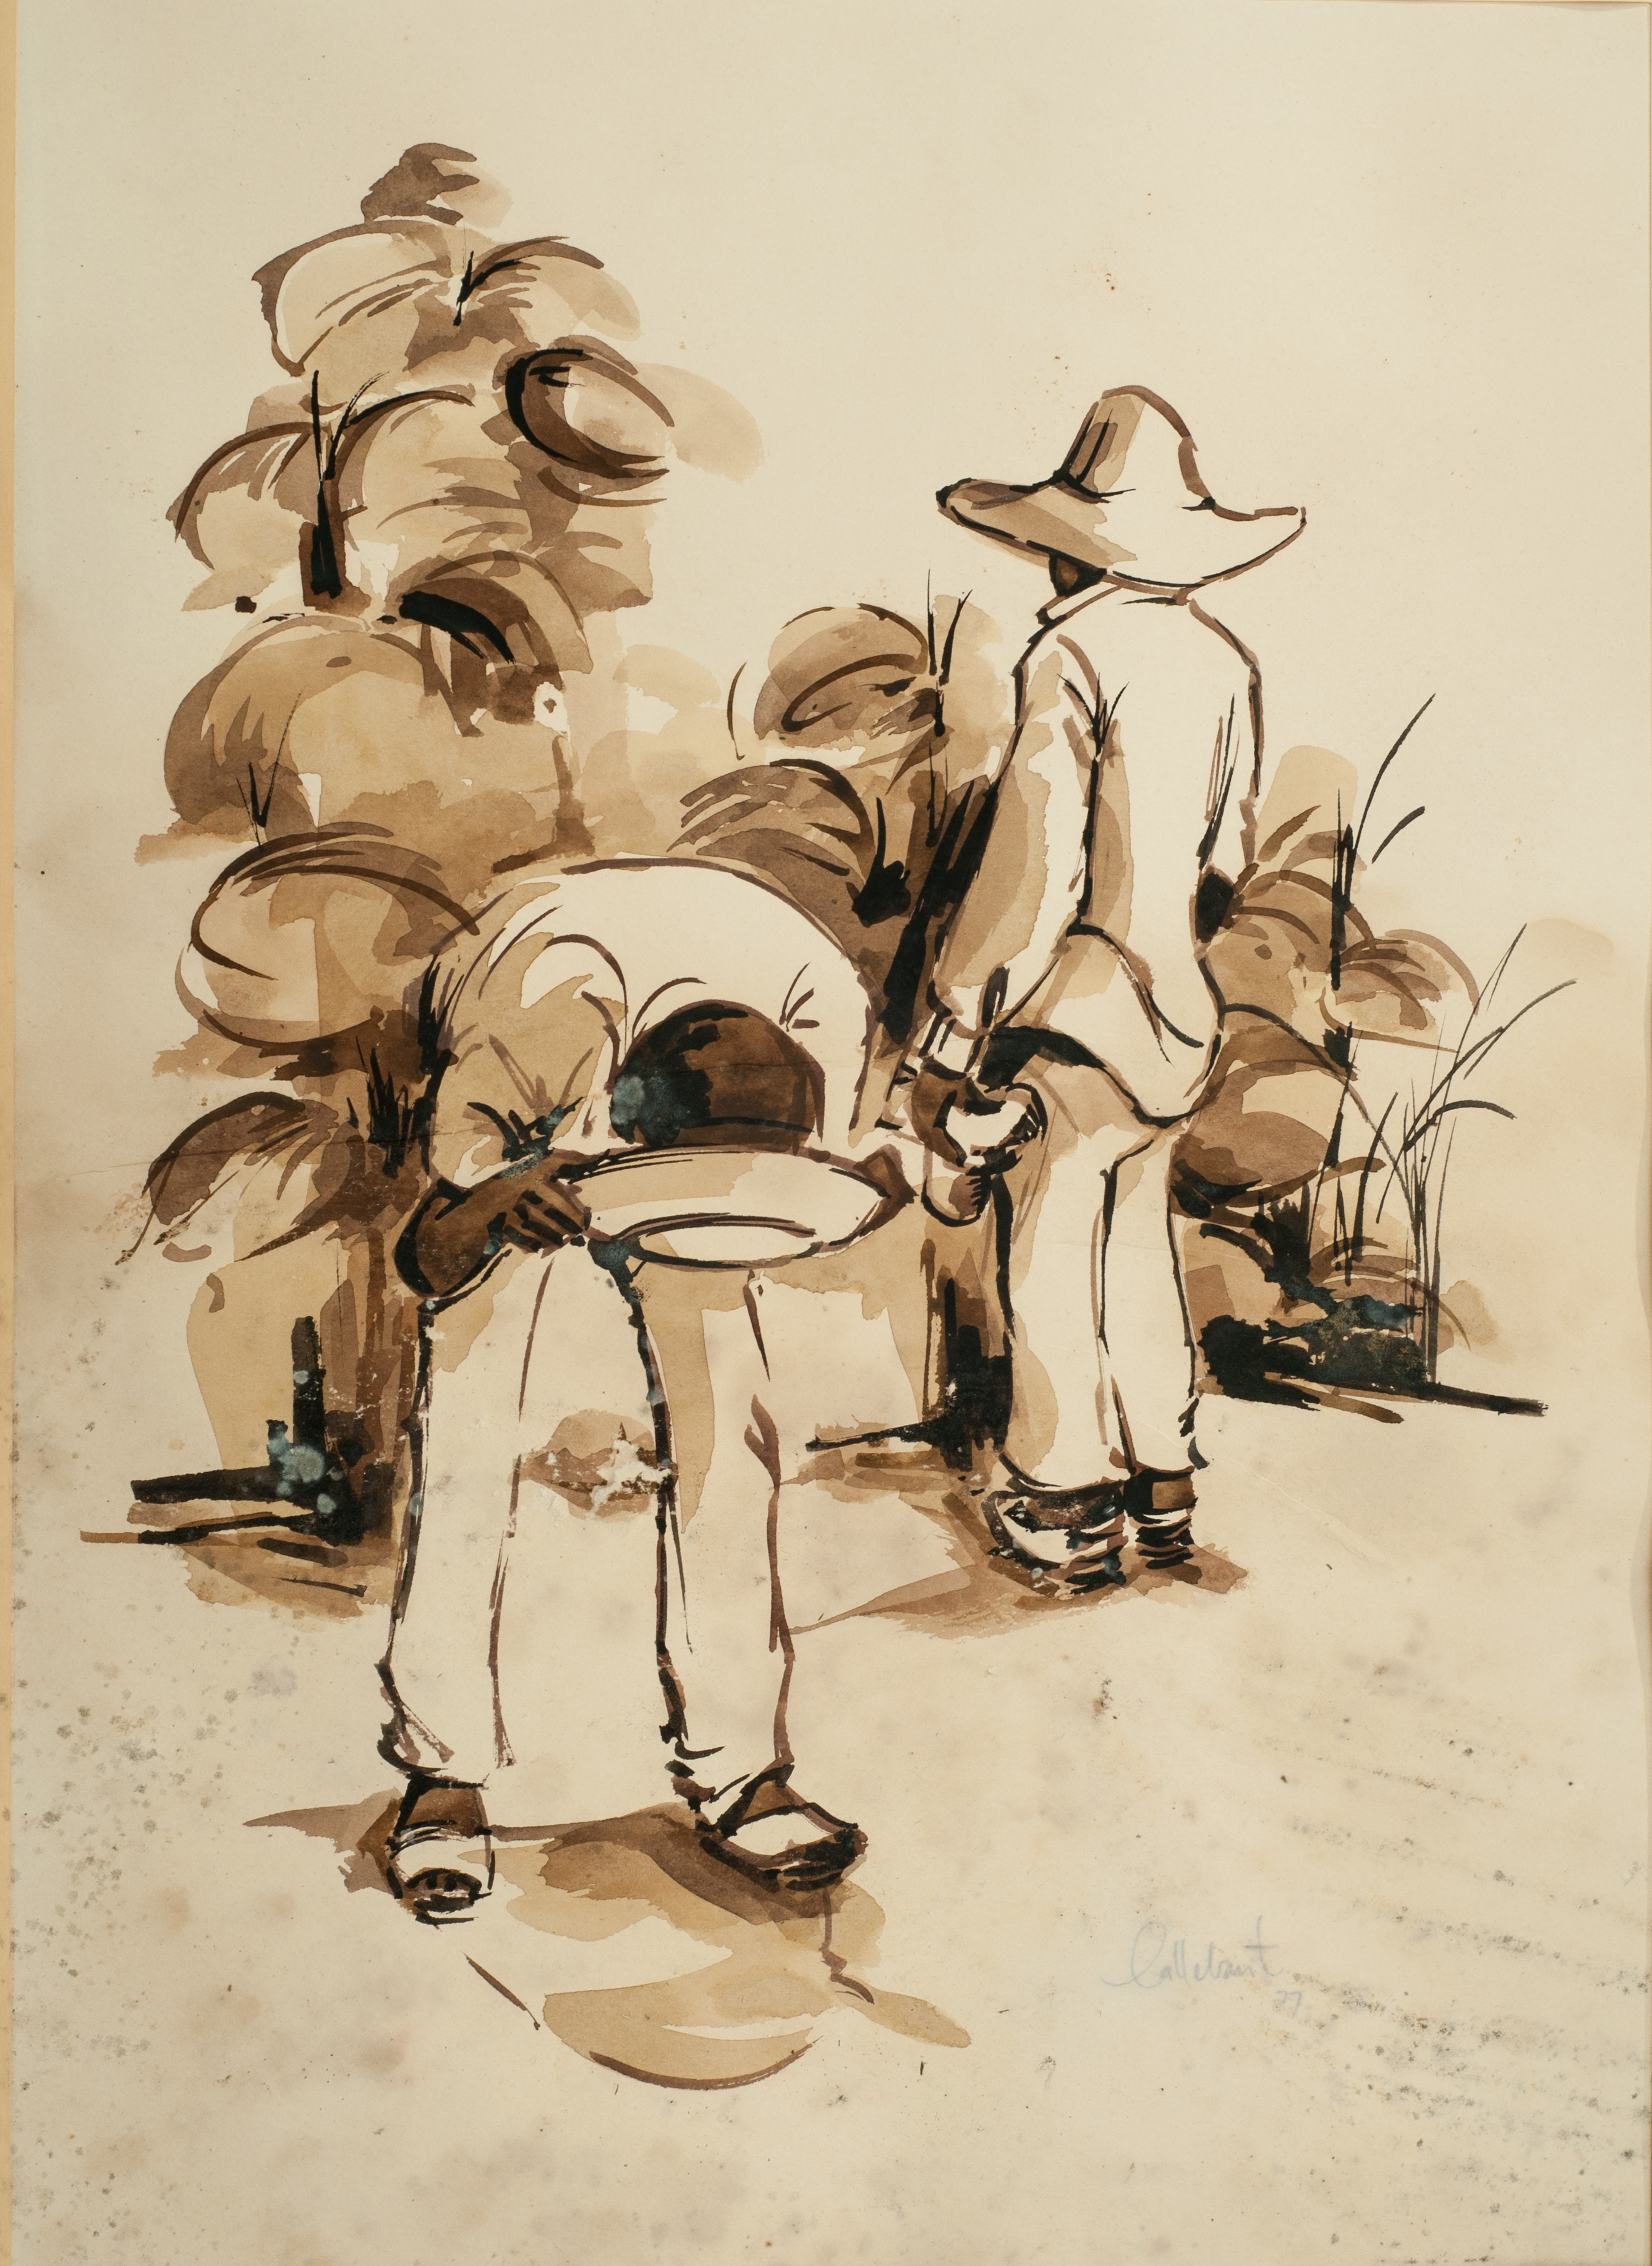 Callebaut Raymond 19 1:2X14 #9-3-96 Lith